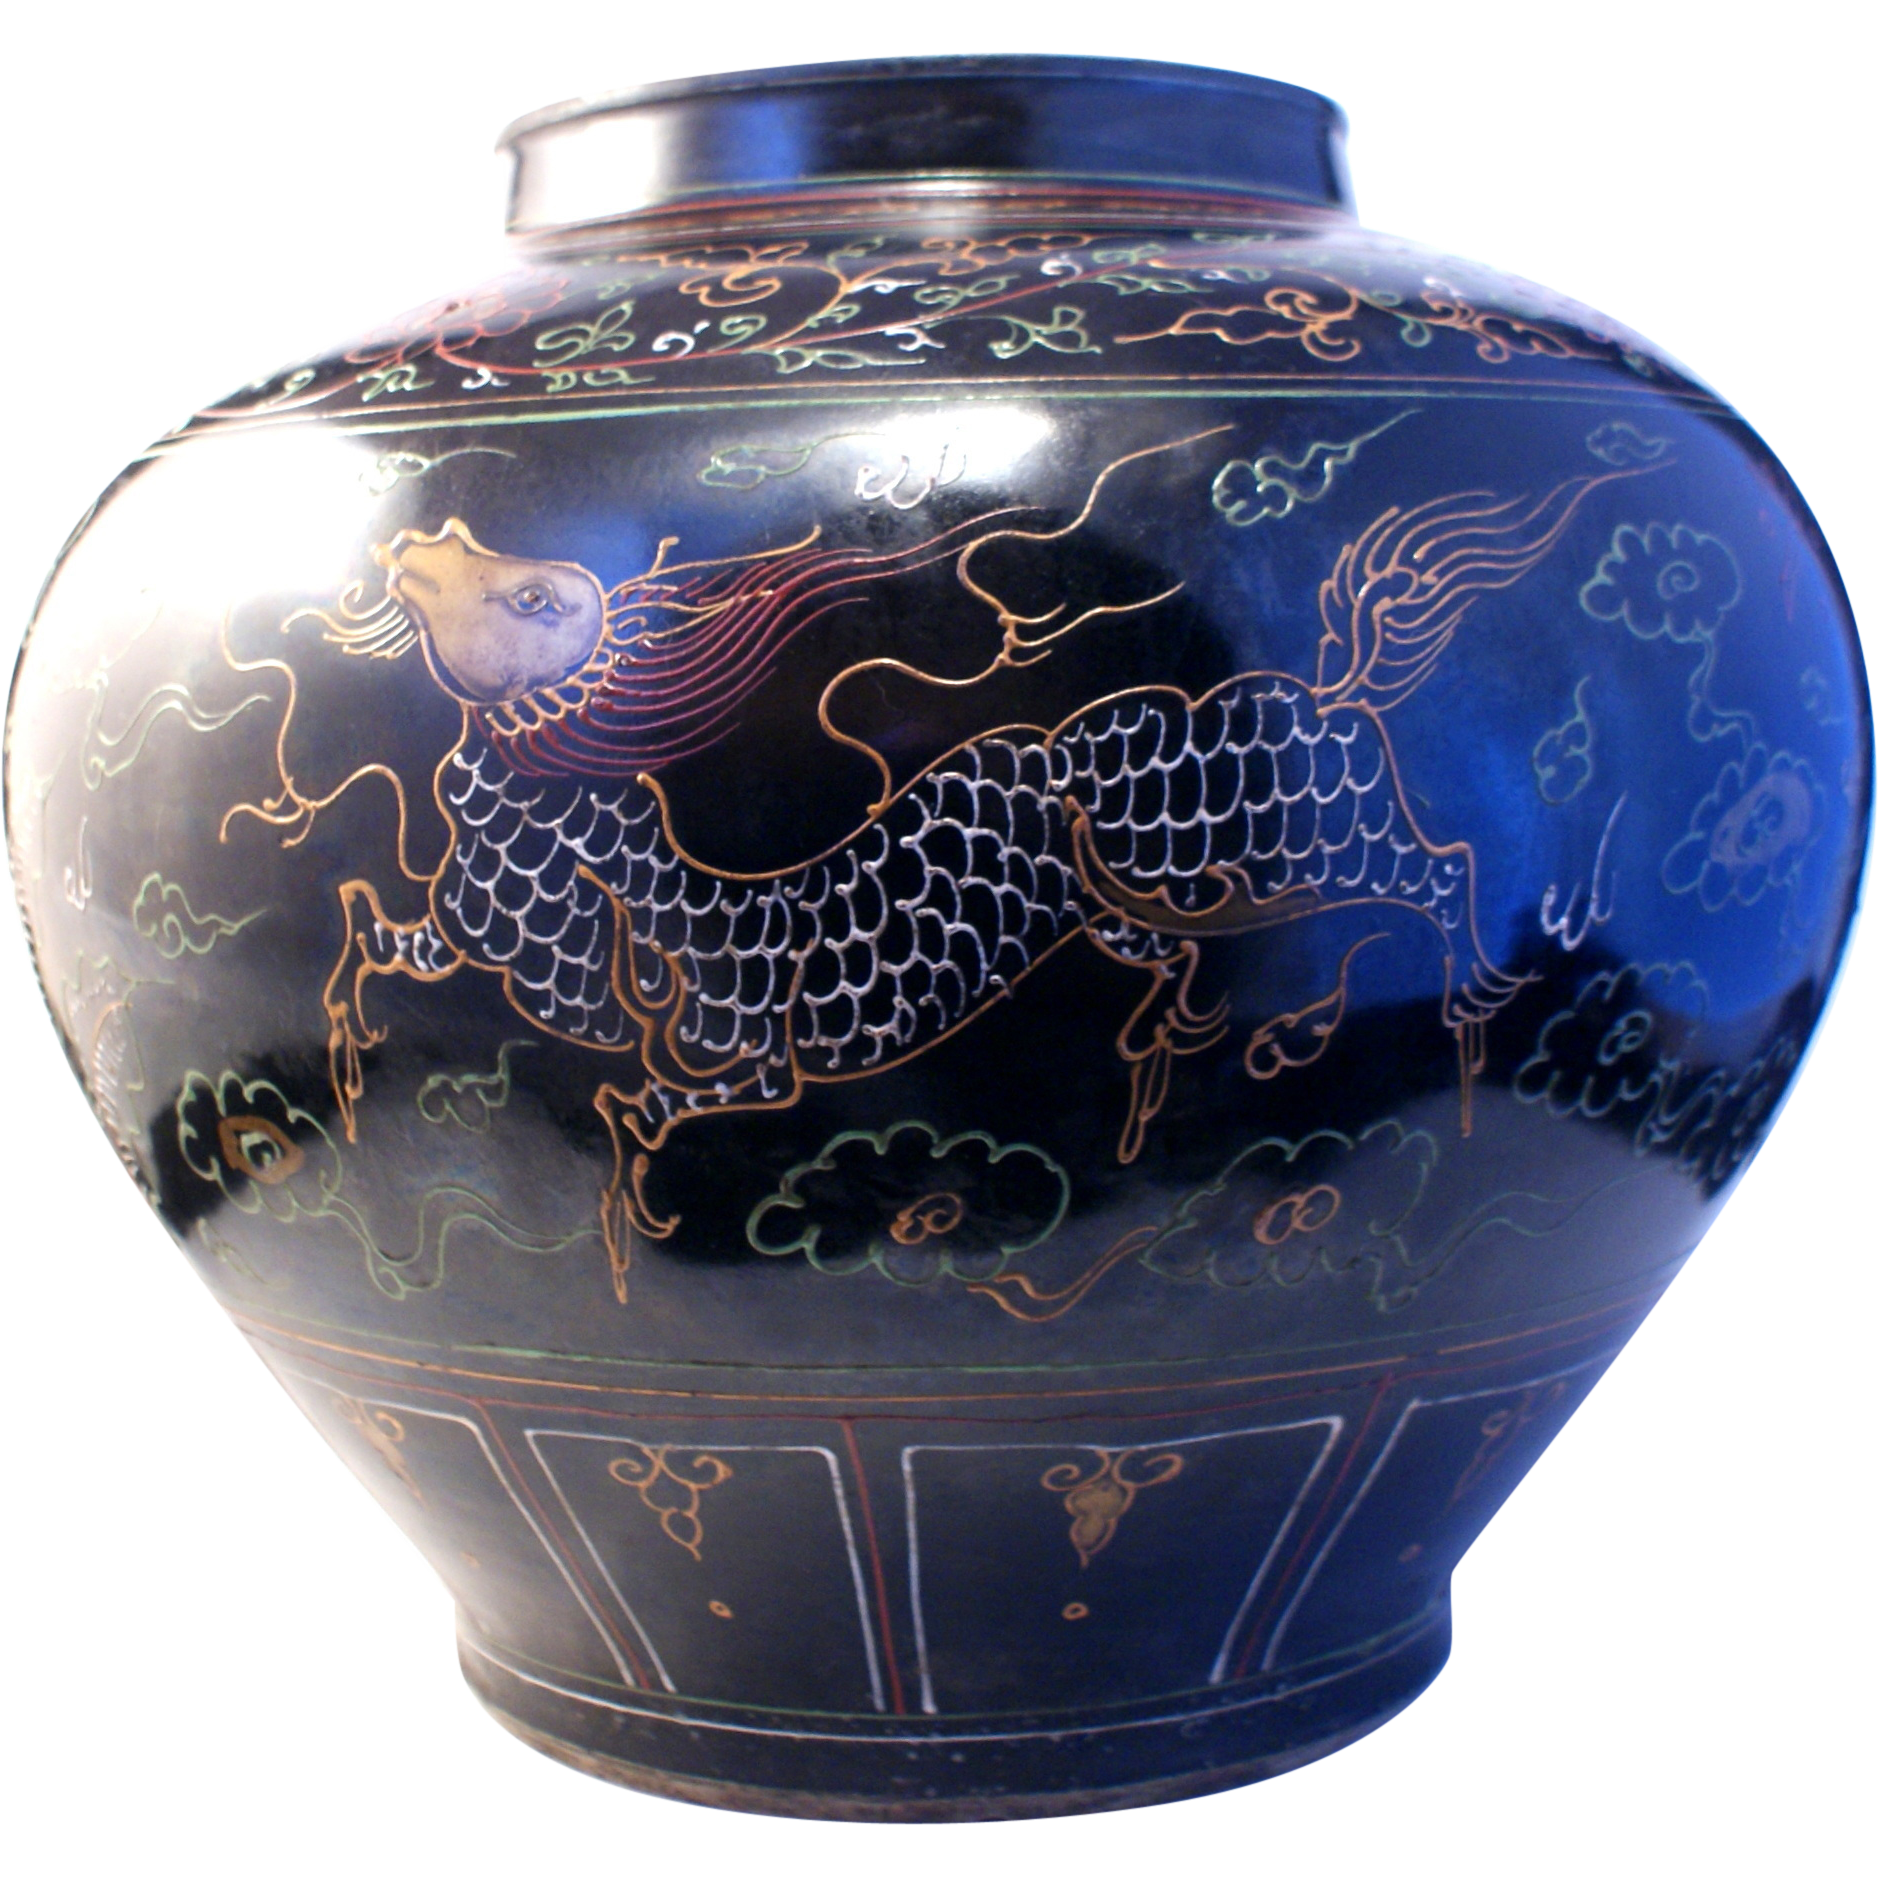 antique 18th century chinese famille noir porcelain vase. Black Bedroom Furniture Sets. Home Design Ideas